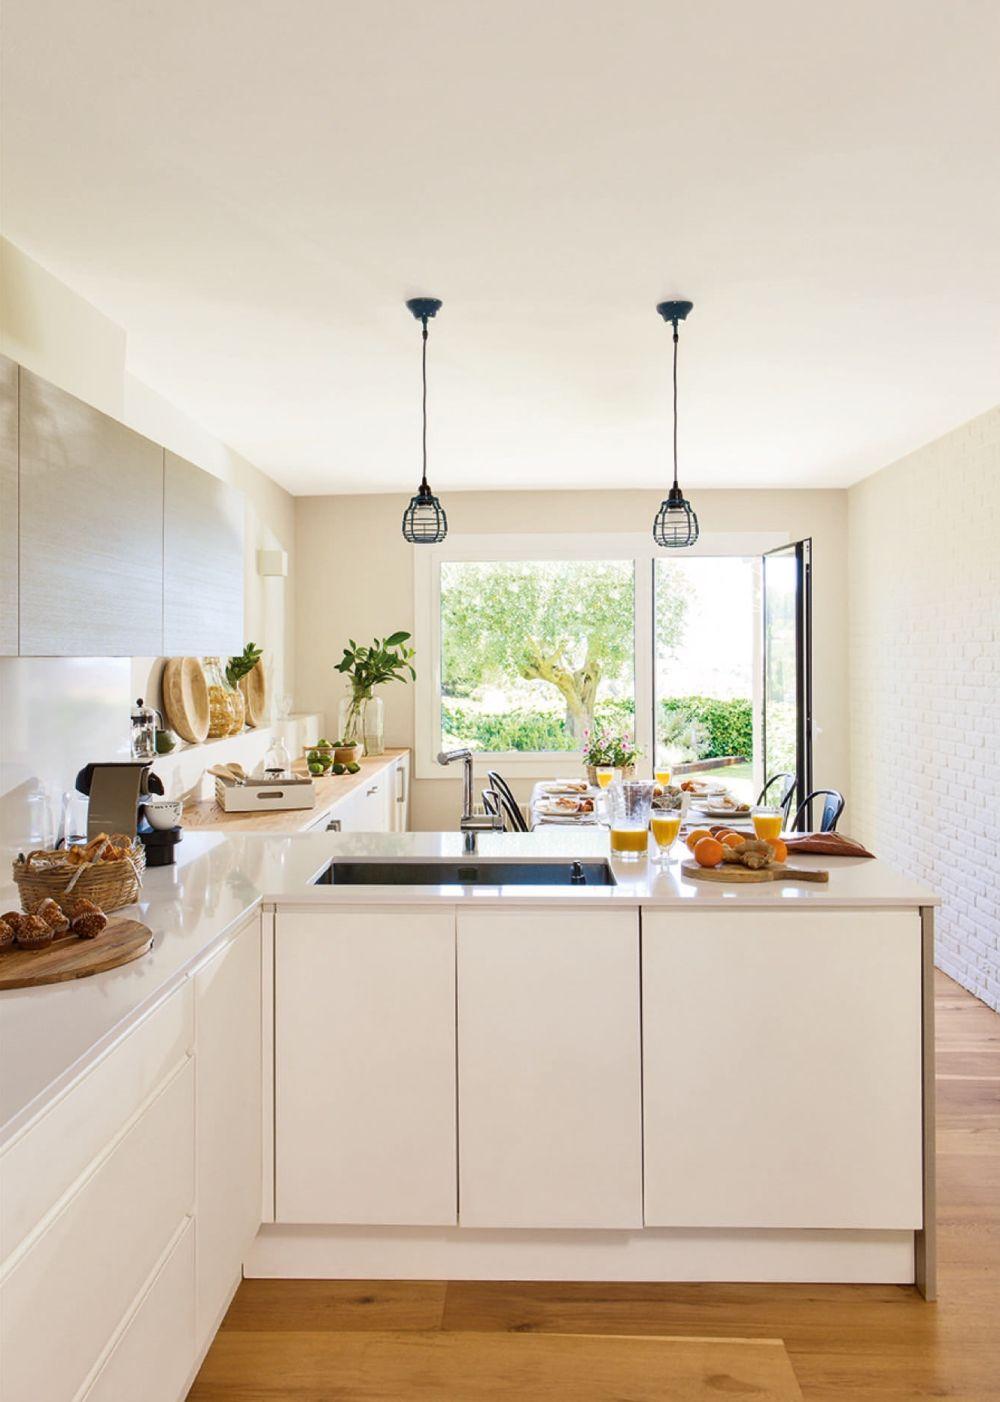 adelaparvu.com despre casa cu gradina, accente marine, designer Jeanette Dresing, Foto Feran Freixa (12)